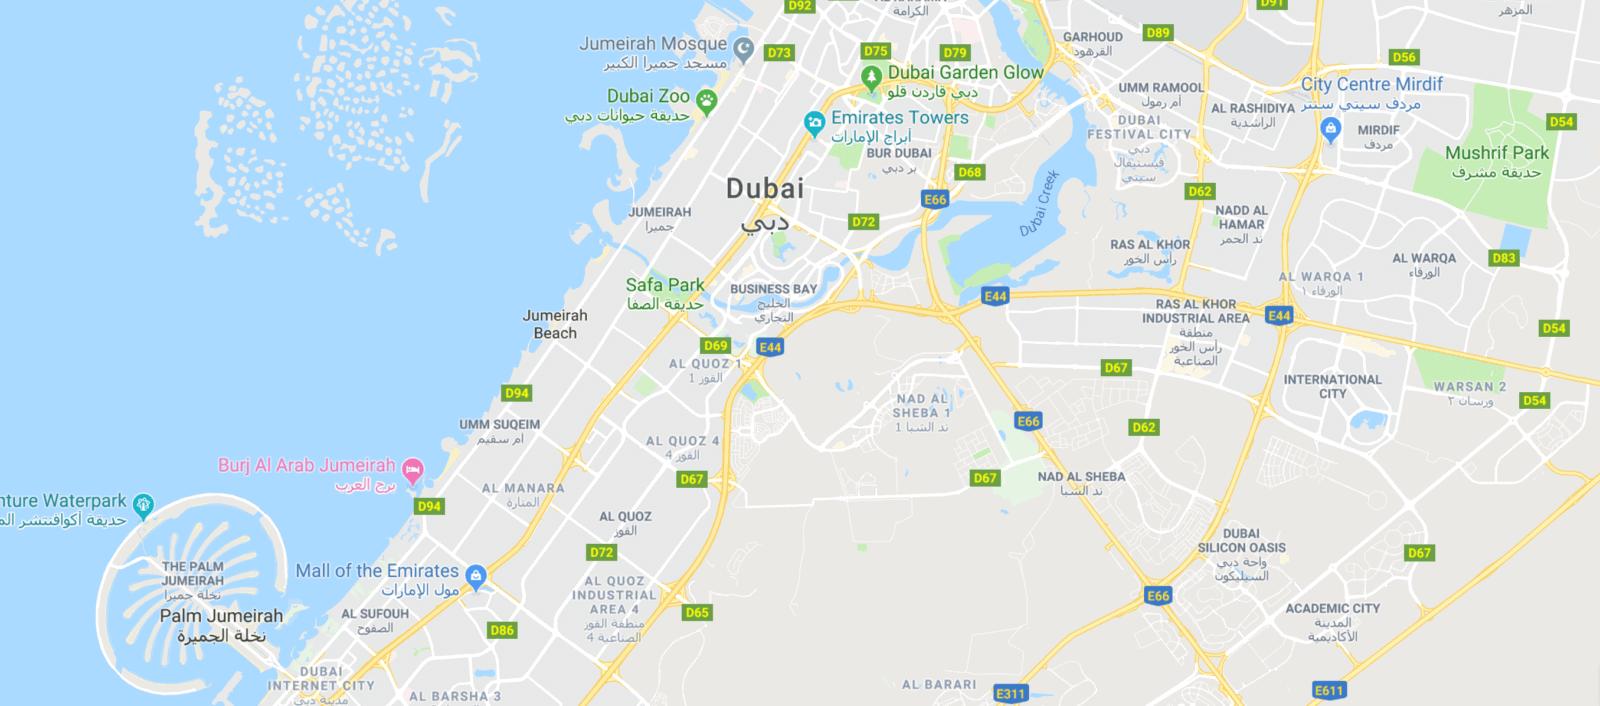 DUBAI-MAP Dubai Map on africa map, arabian gulf map, europe map, germany map, united arab emirates, dubai international airport, sharjah city map, japan map, middle east map, dubai mall, fujairah map, emirates airline, dead sea map, spain map, uae map, abu dhabi map, burj al-arab, turkey map, istanbul map, abu dhabi, kuwait map, israel map, qatar map, ski dubai, seattle map, palm islands, palm jumeirah, beirut map, burj khalifa,